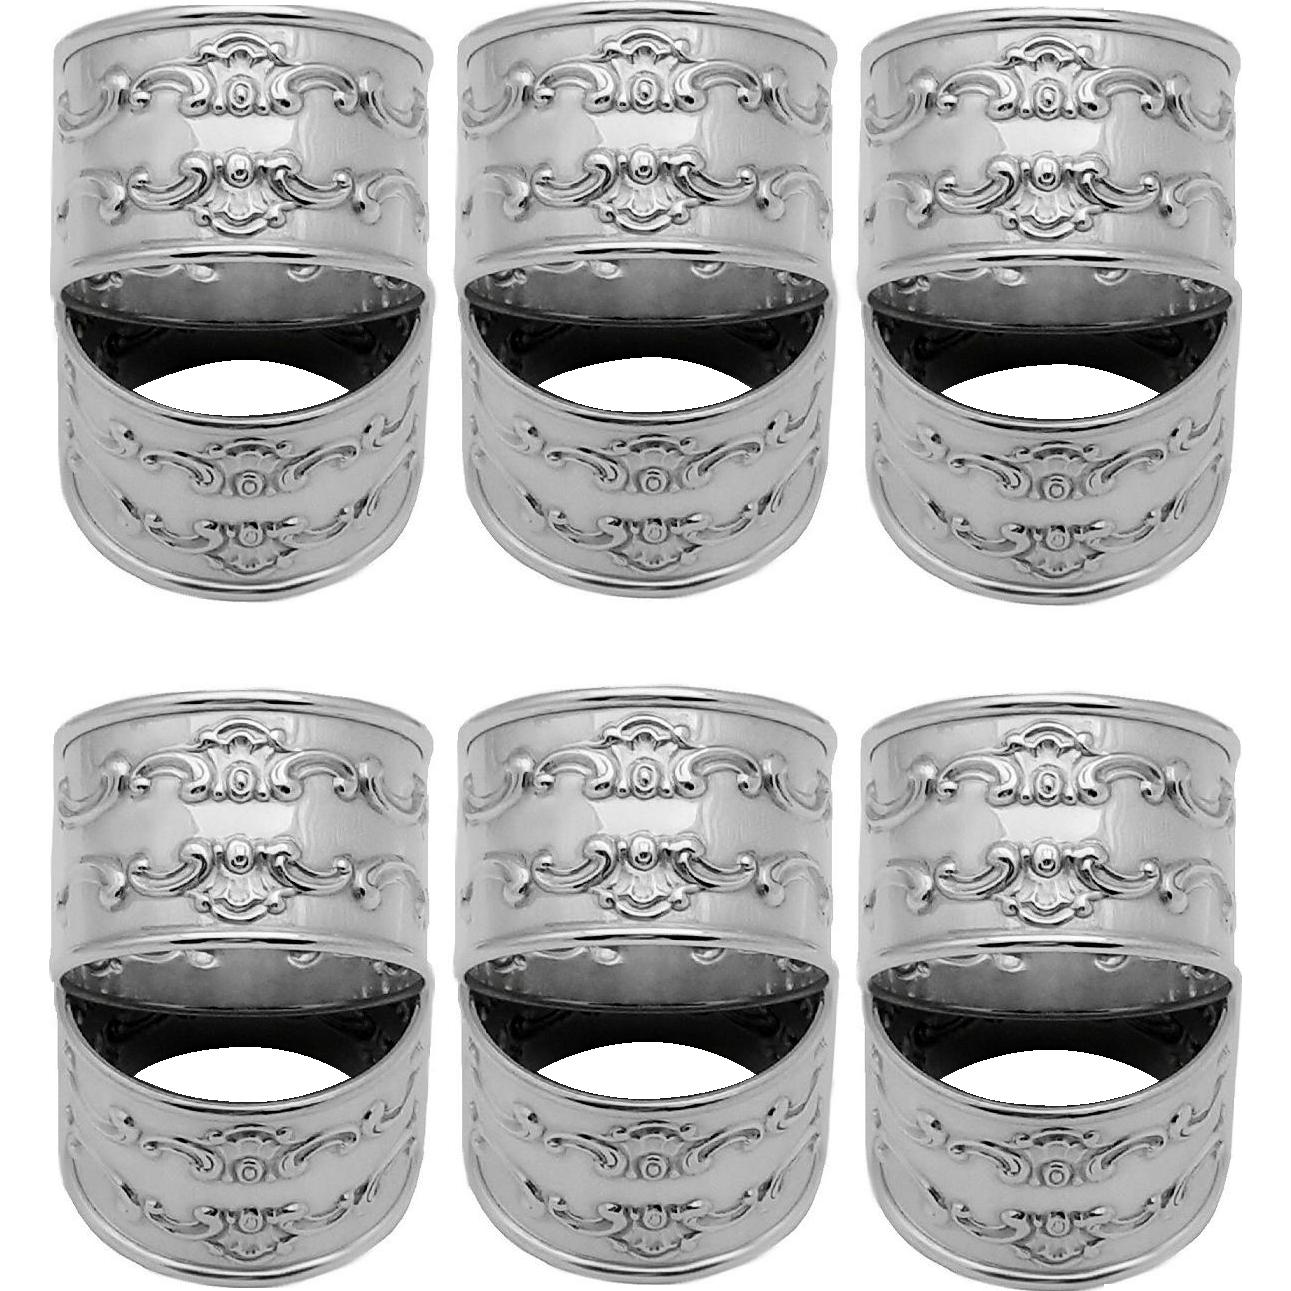 Set of 12 Sterling Silver Gorham Strasbourg Napkin Rings 1150 Mint Condition